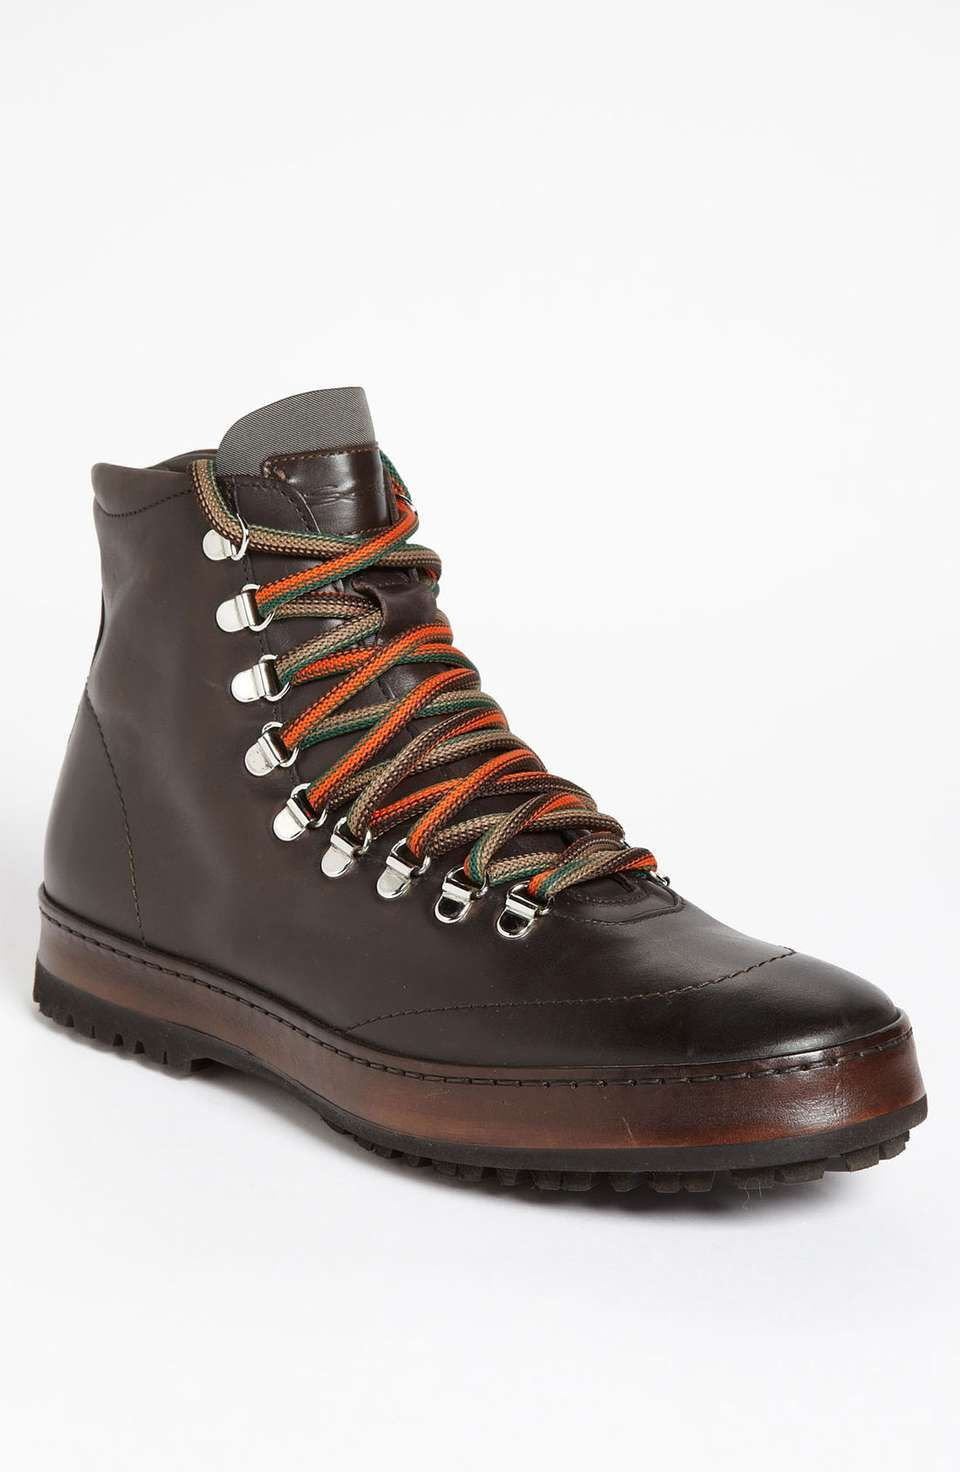 ebce46fa997 Santoni 'Cool City' Boot | mens boots | mens hiking boots | fall ...